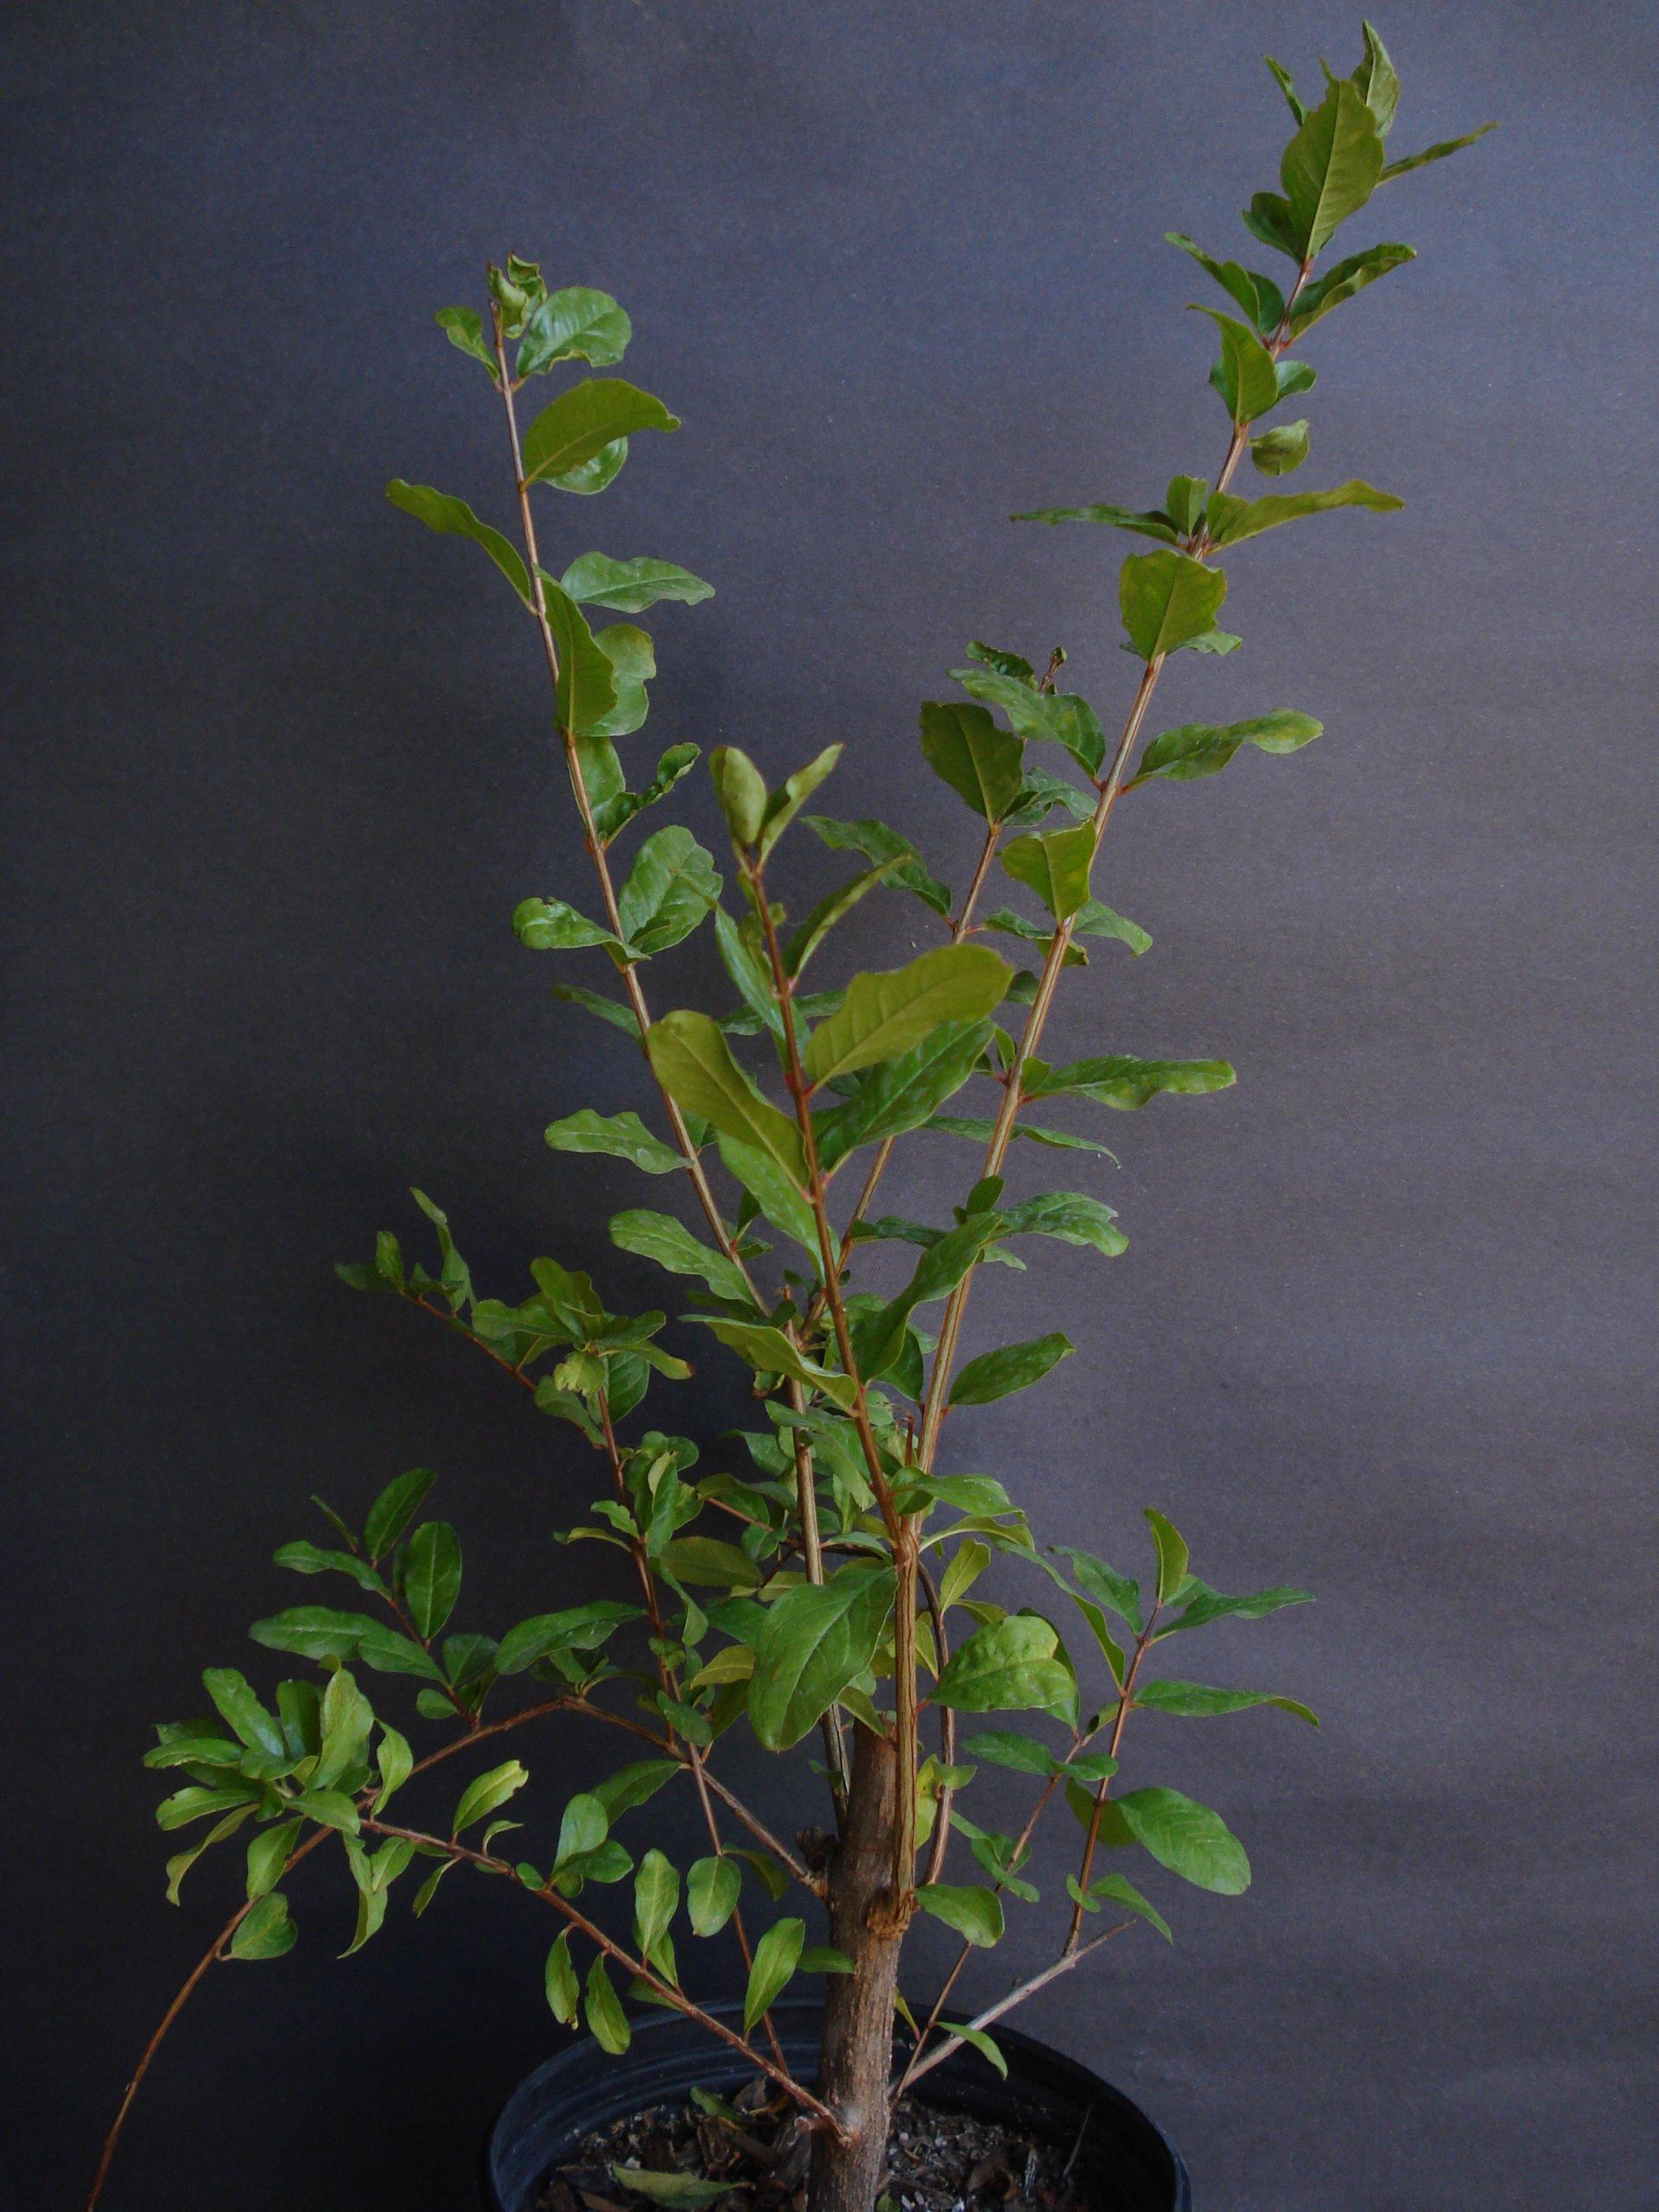 9EzTropical - Pomegranate Utah Sweet Fruit Tree Live Plant - 2 Feet or Taller - Ship in 1 Gal Pot